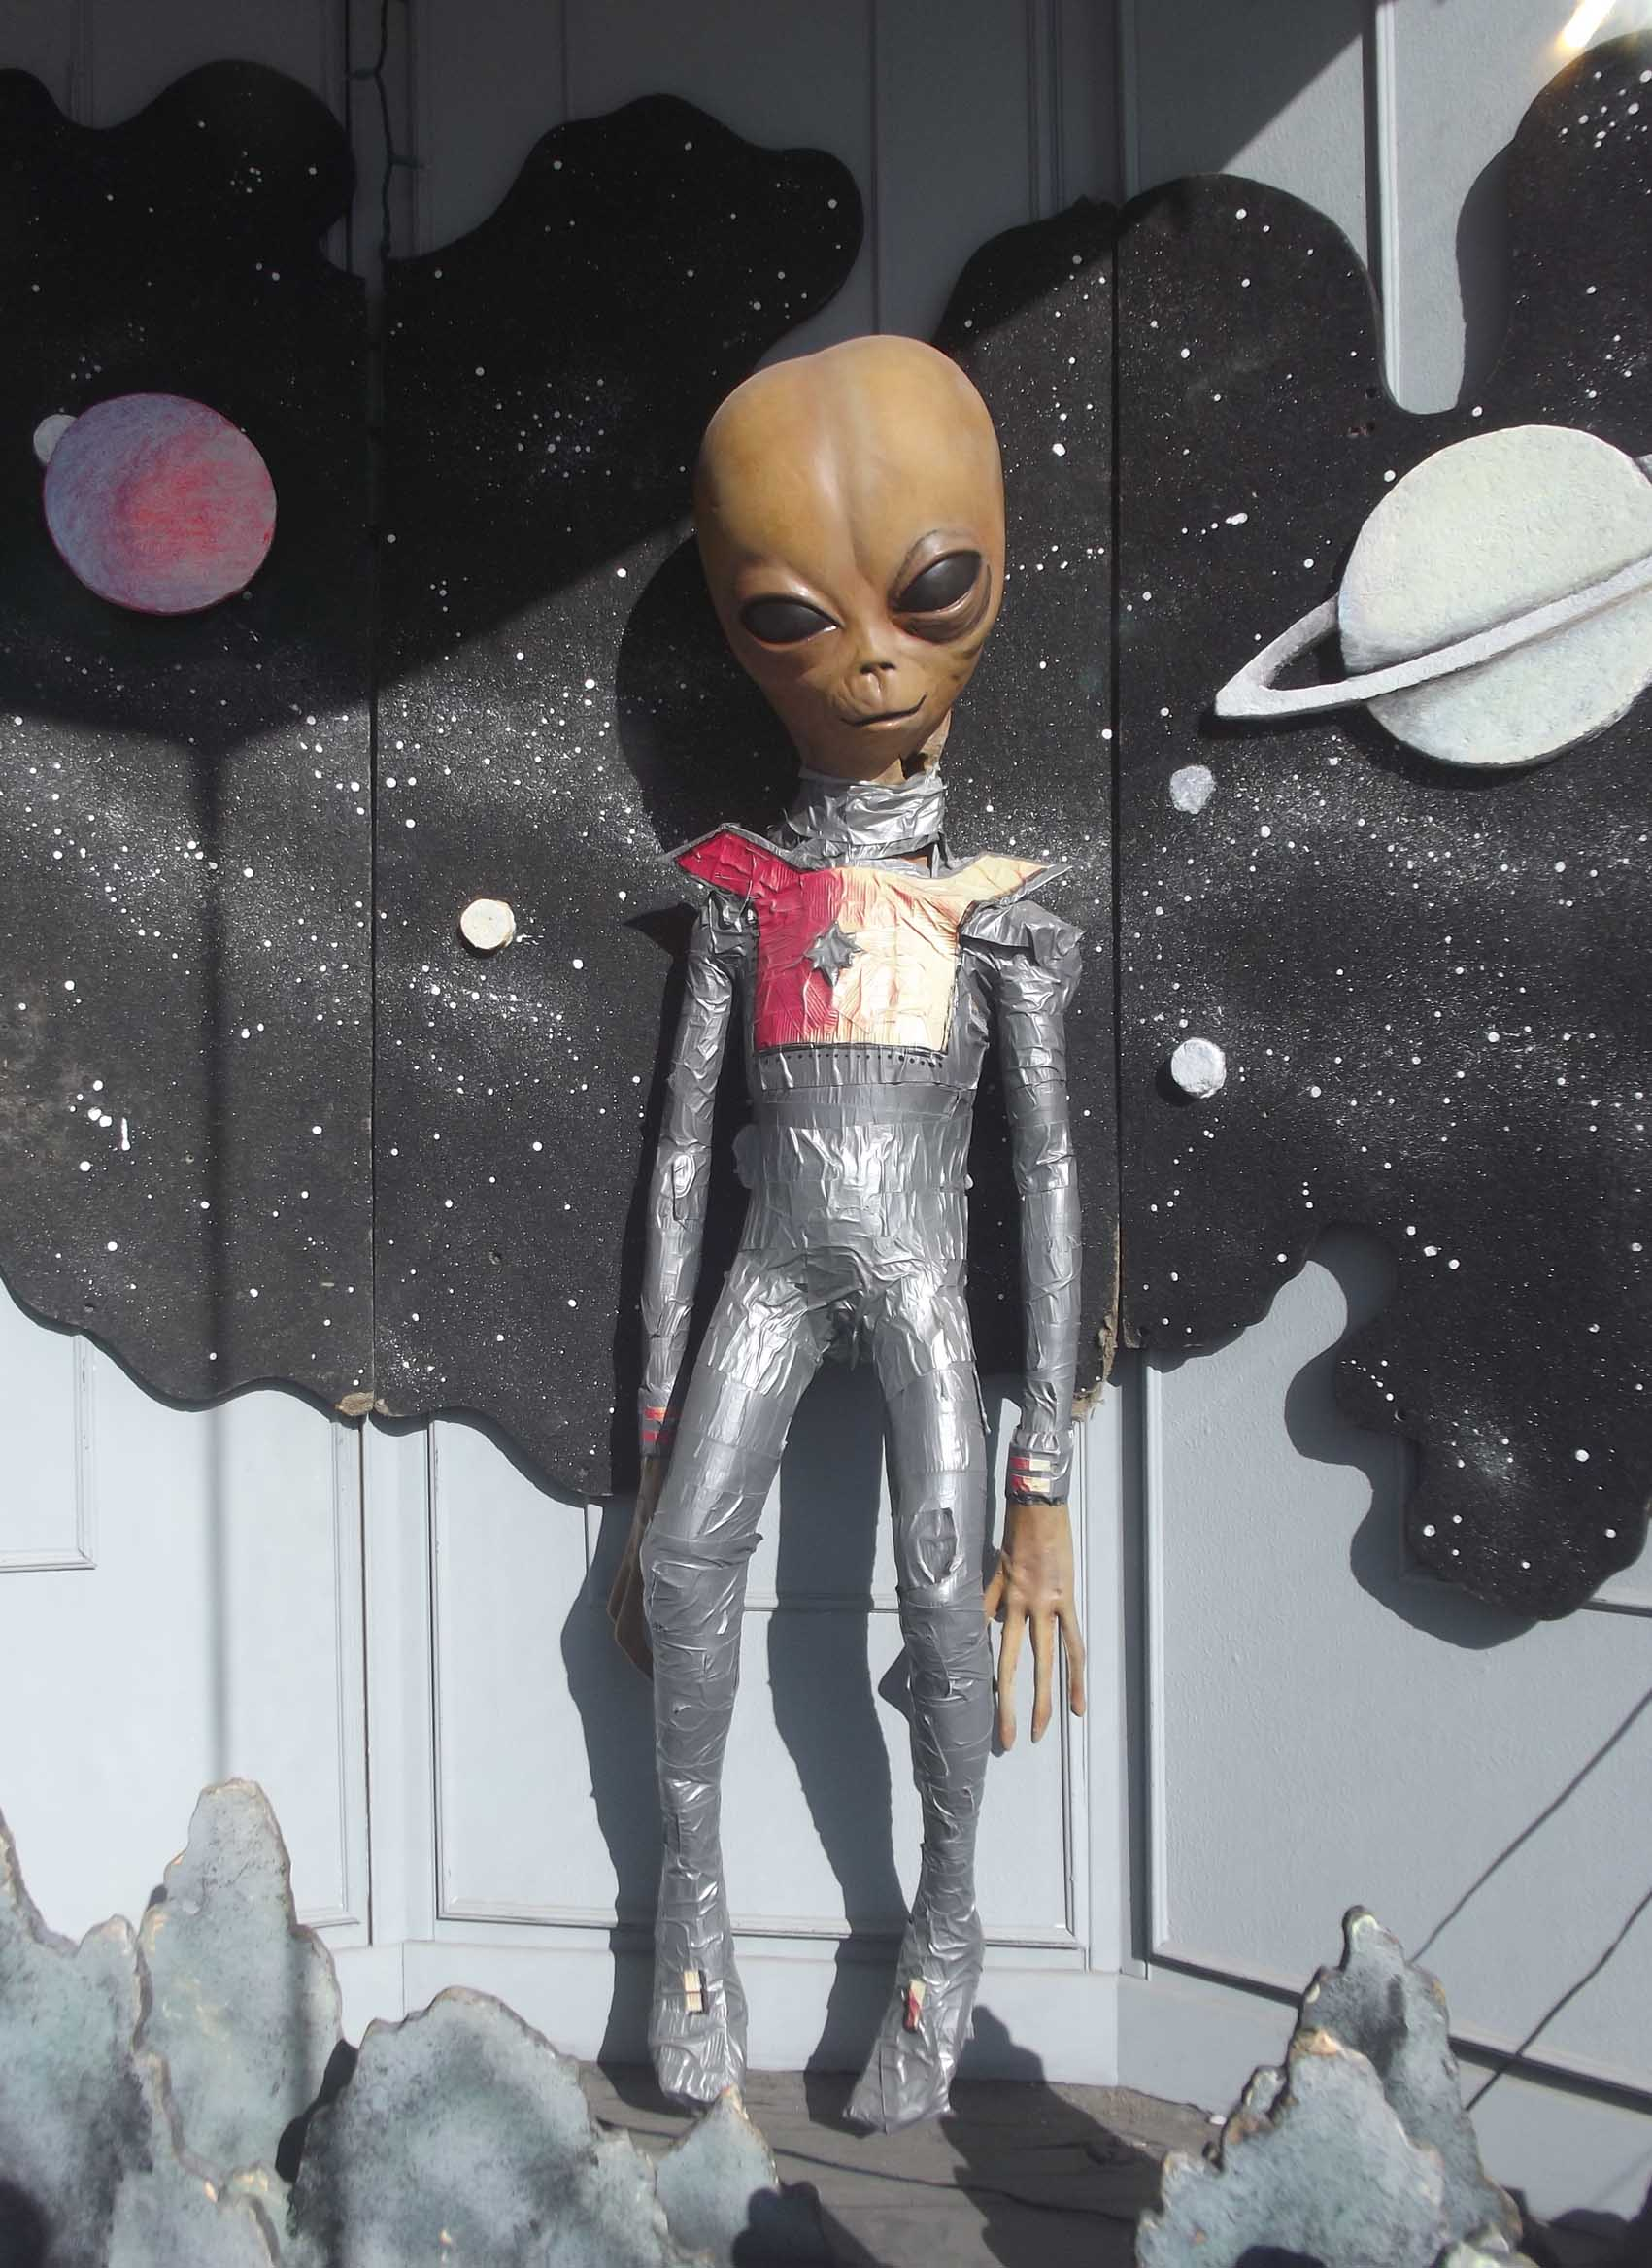 Alien model in spacesuit